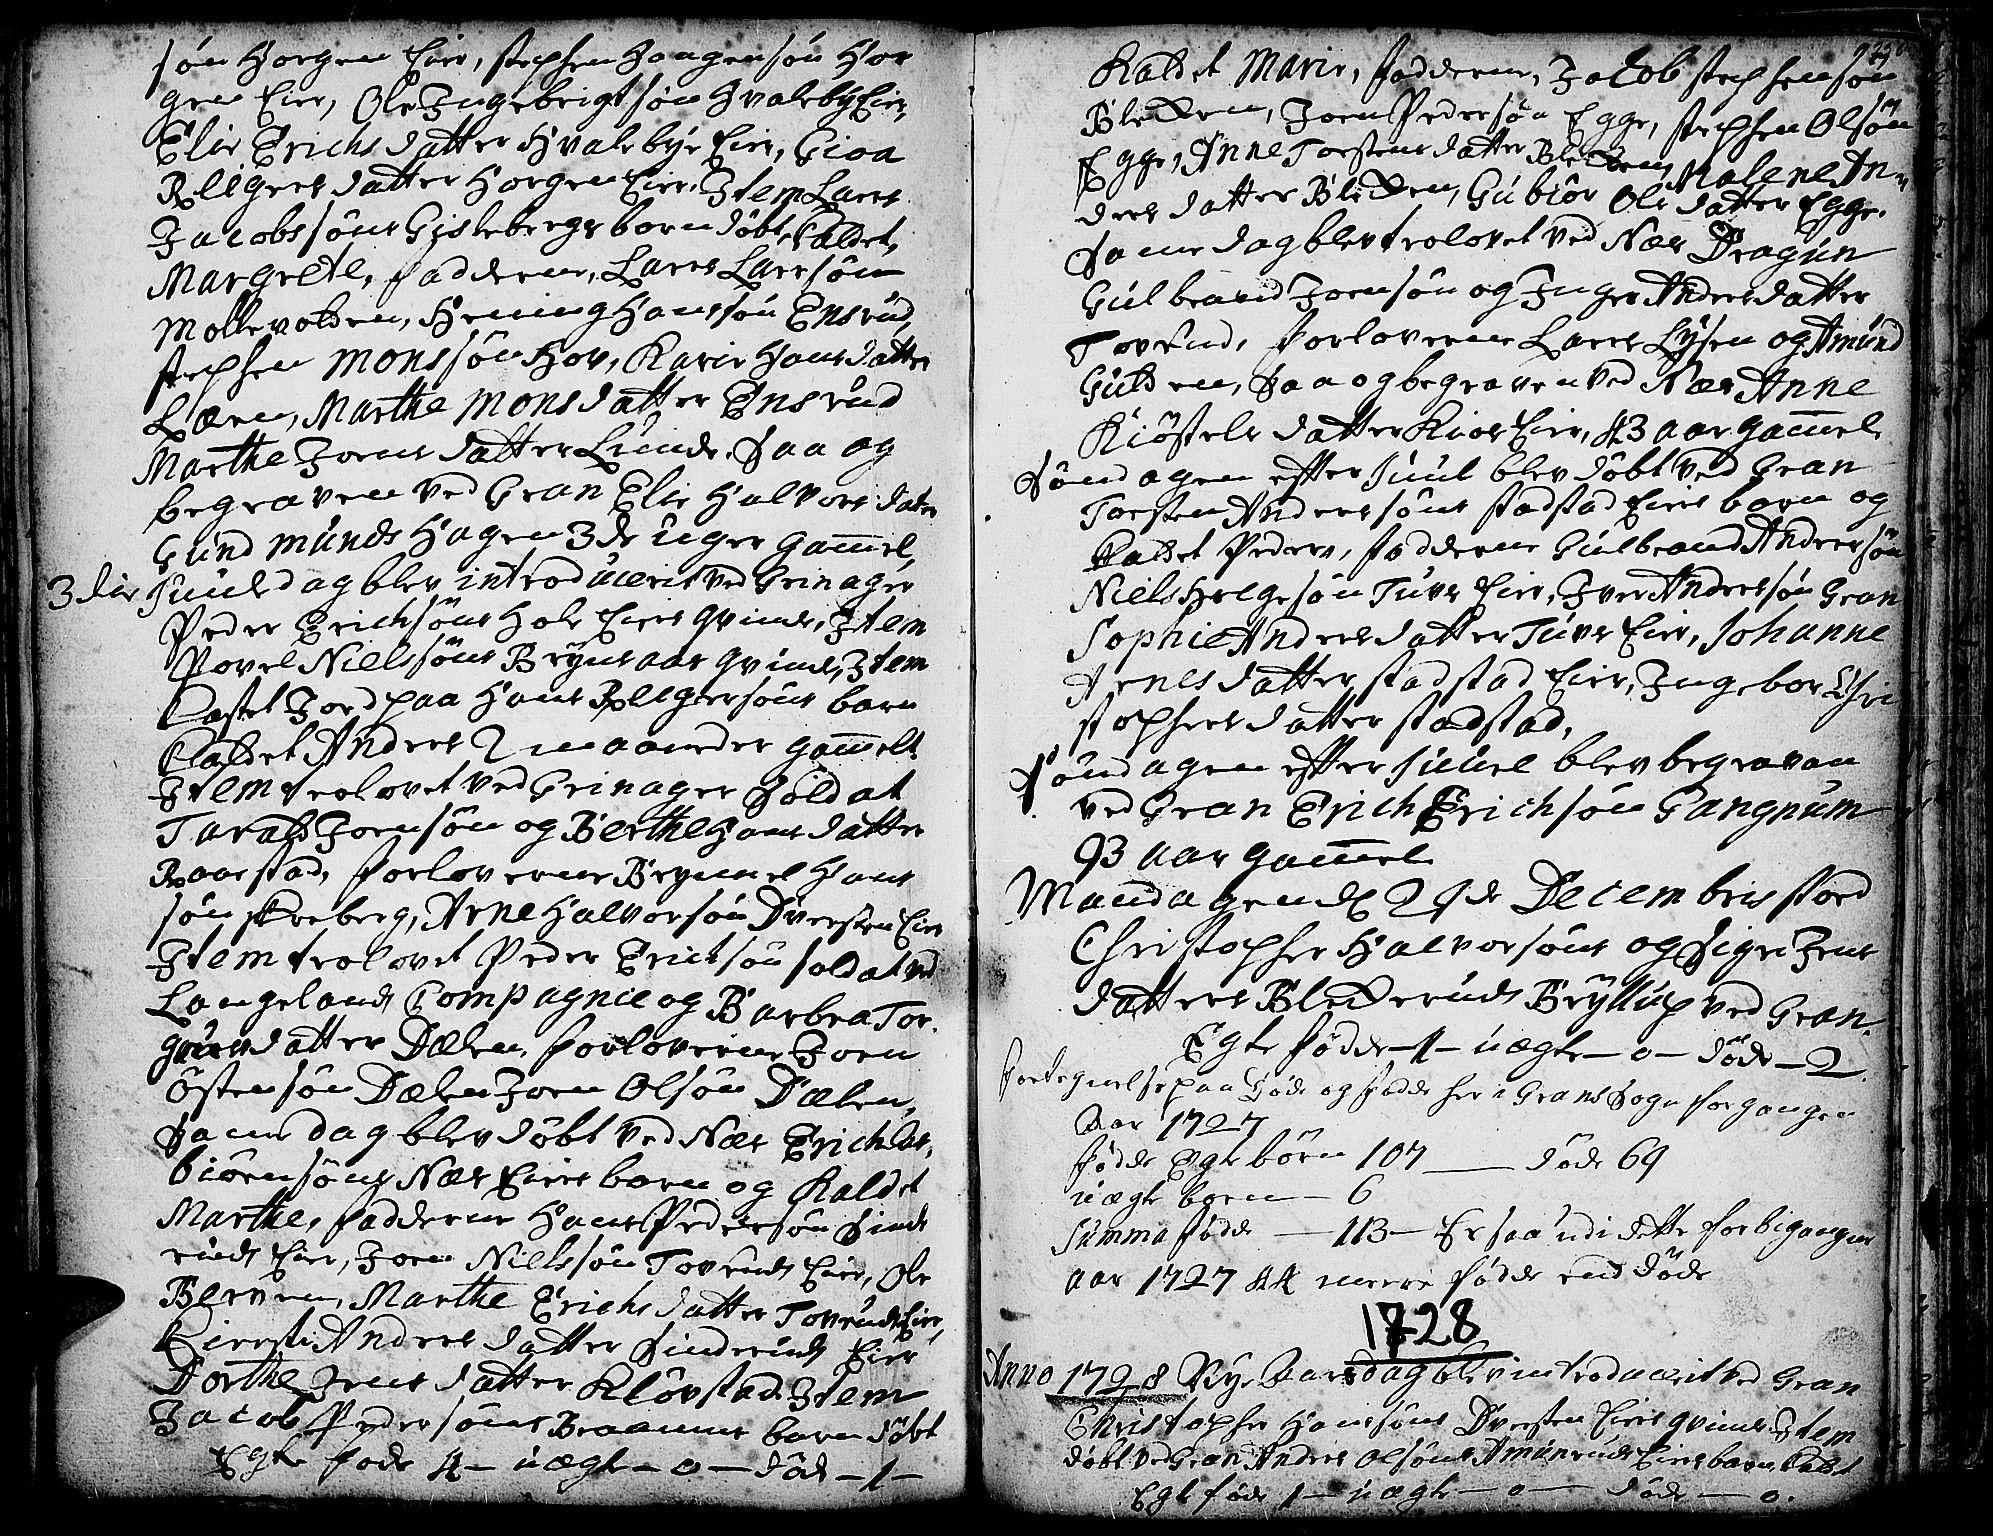 SAH, Gran prestekontor, Ministerialbok nr. 1, 1707-1731, s. 236